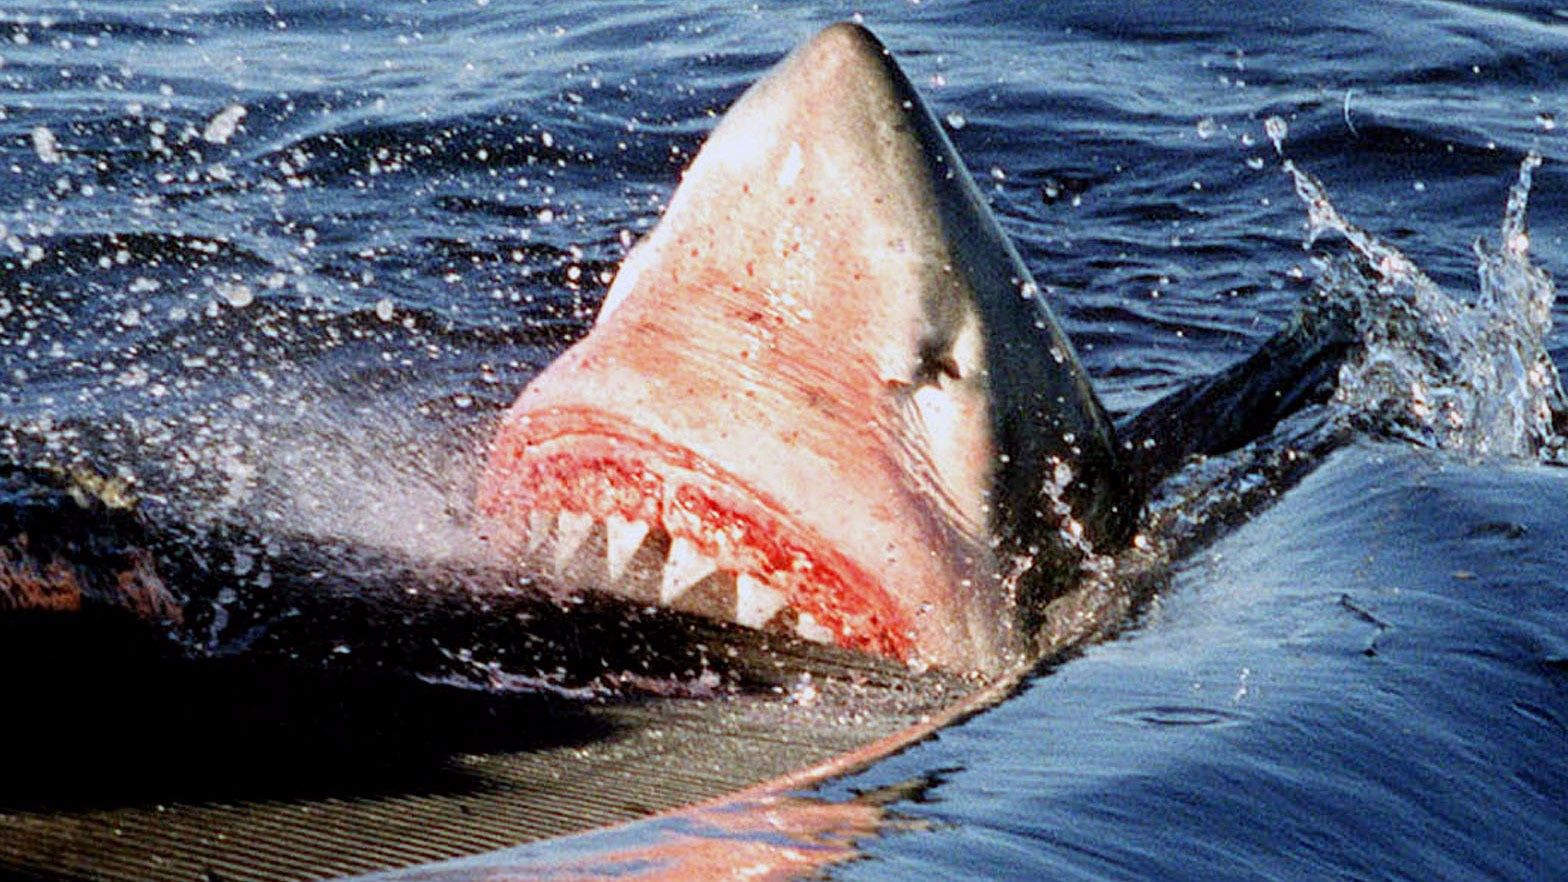 A shark attacks a man in Australia